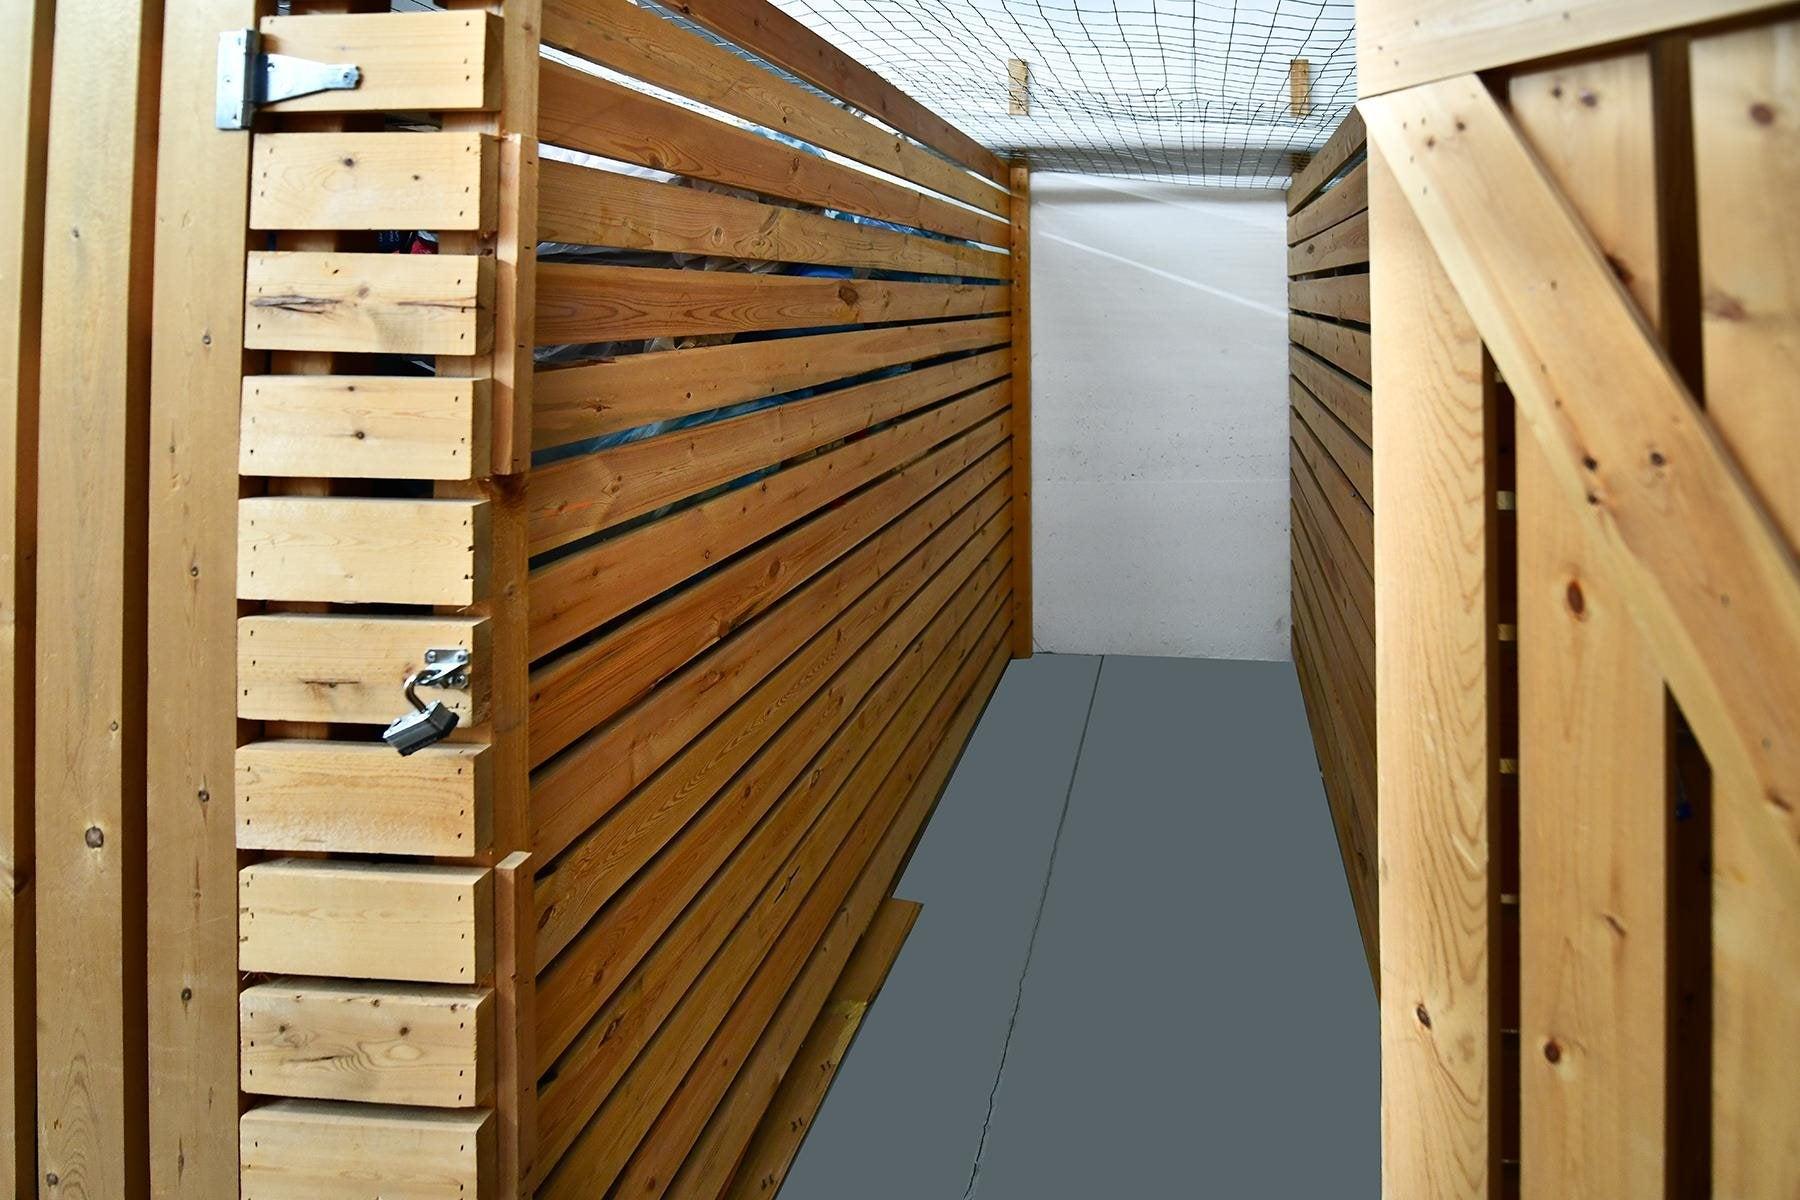 204 5790 EAST BOULEVARD - Kerrisdale Apartment/Condo for sale, 3 Bedrooms (R2604138) - #26